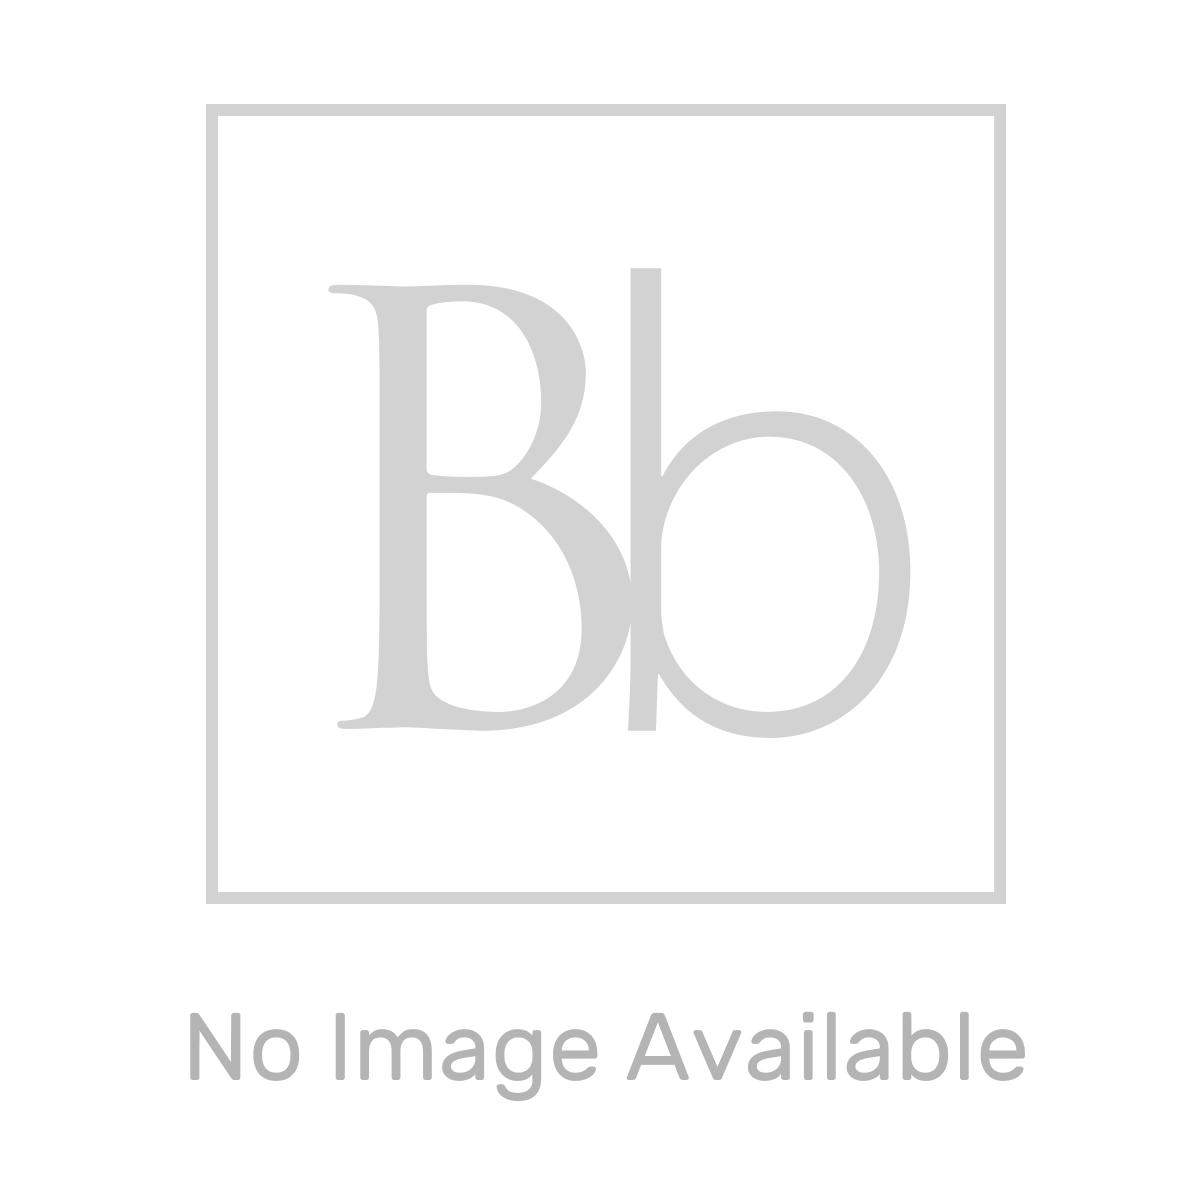 HiB Breeze Wall Mounted Wetroom Extractor Fan with Humidity Sensor in Matt Silver